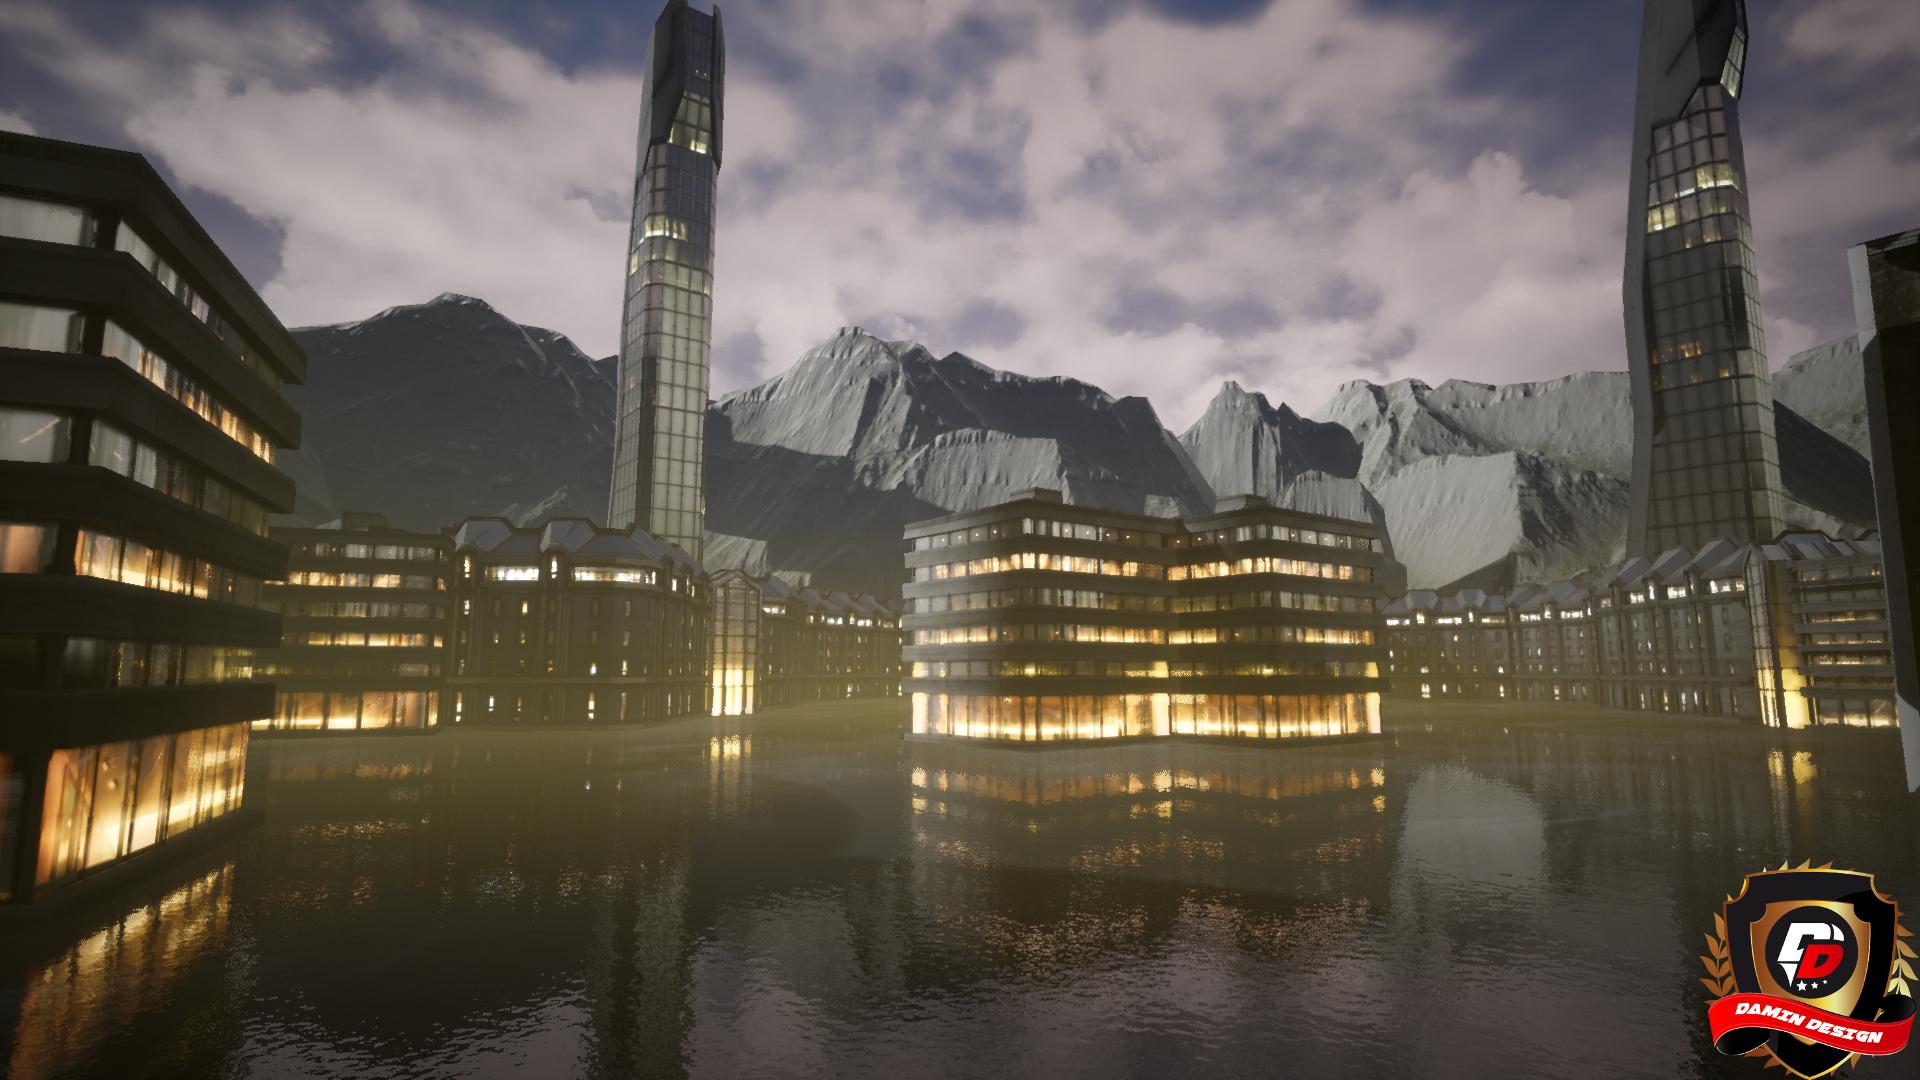 Unreal Engine 4 Dark City by DaminDesign